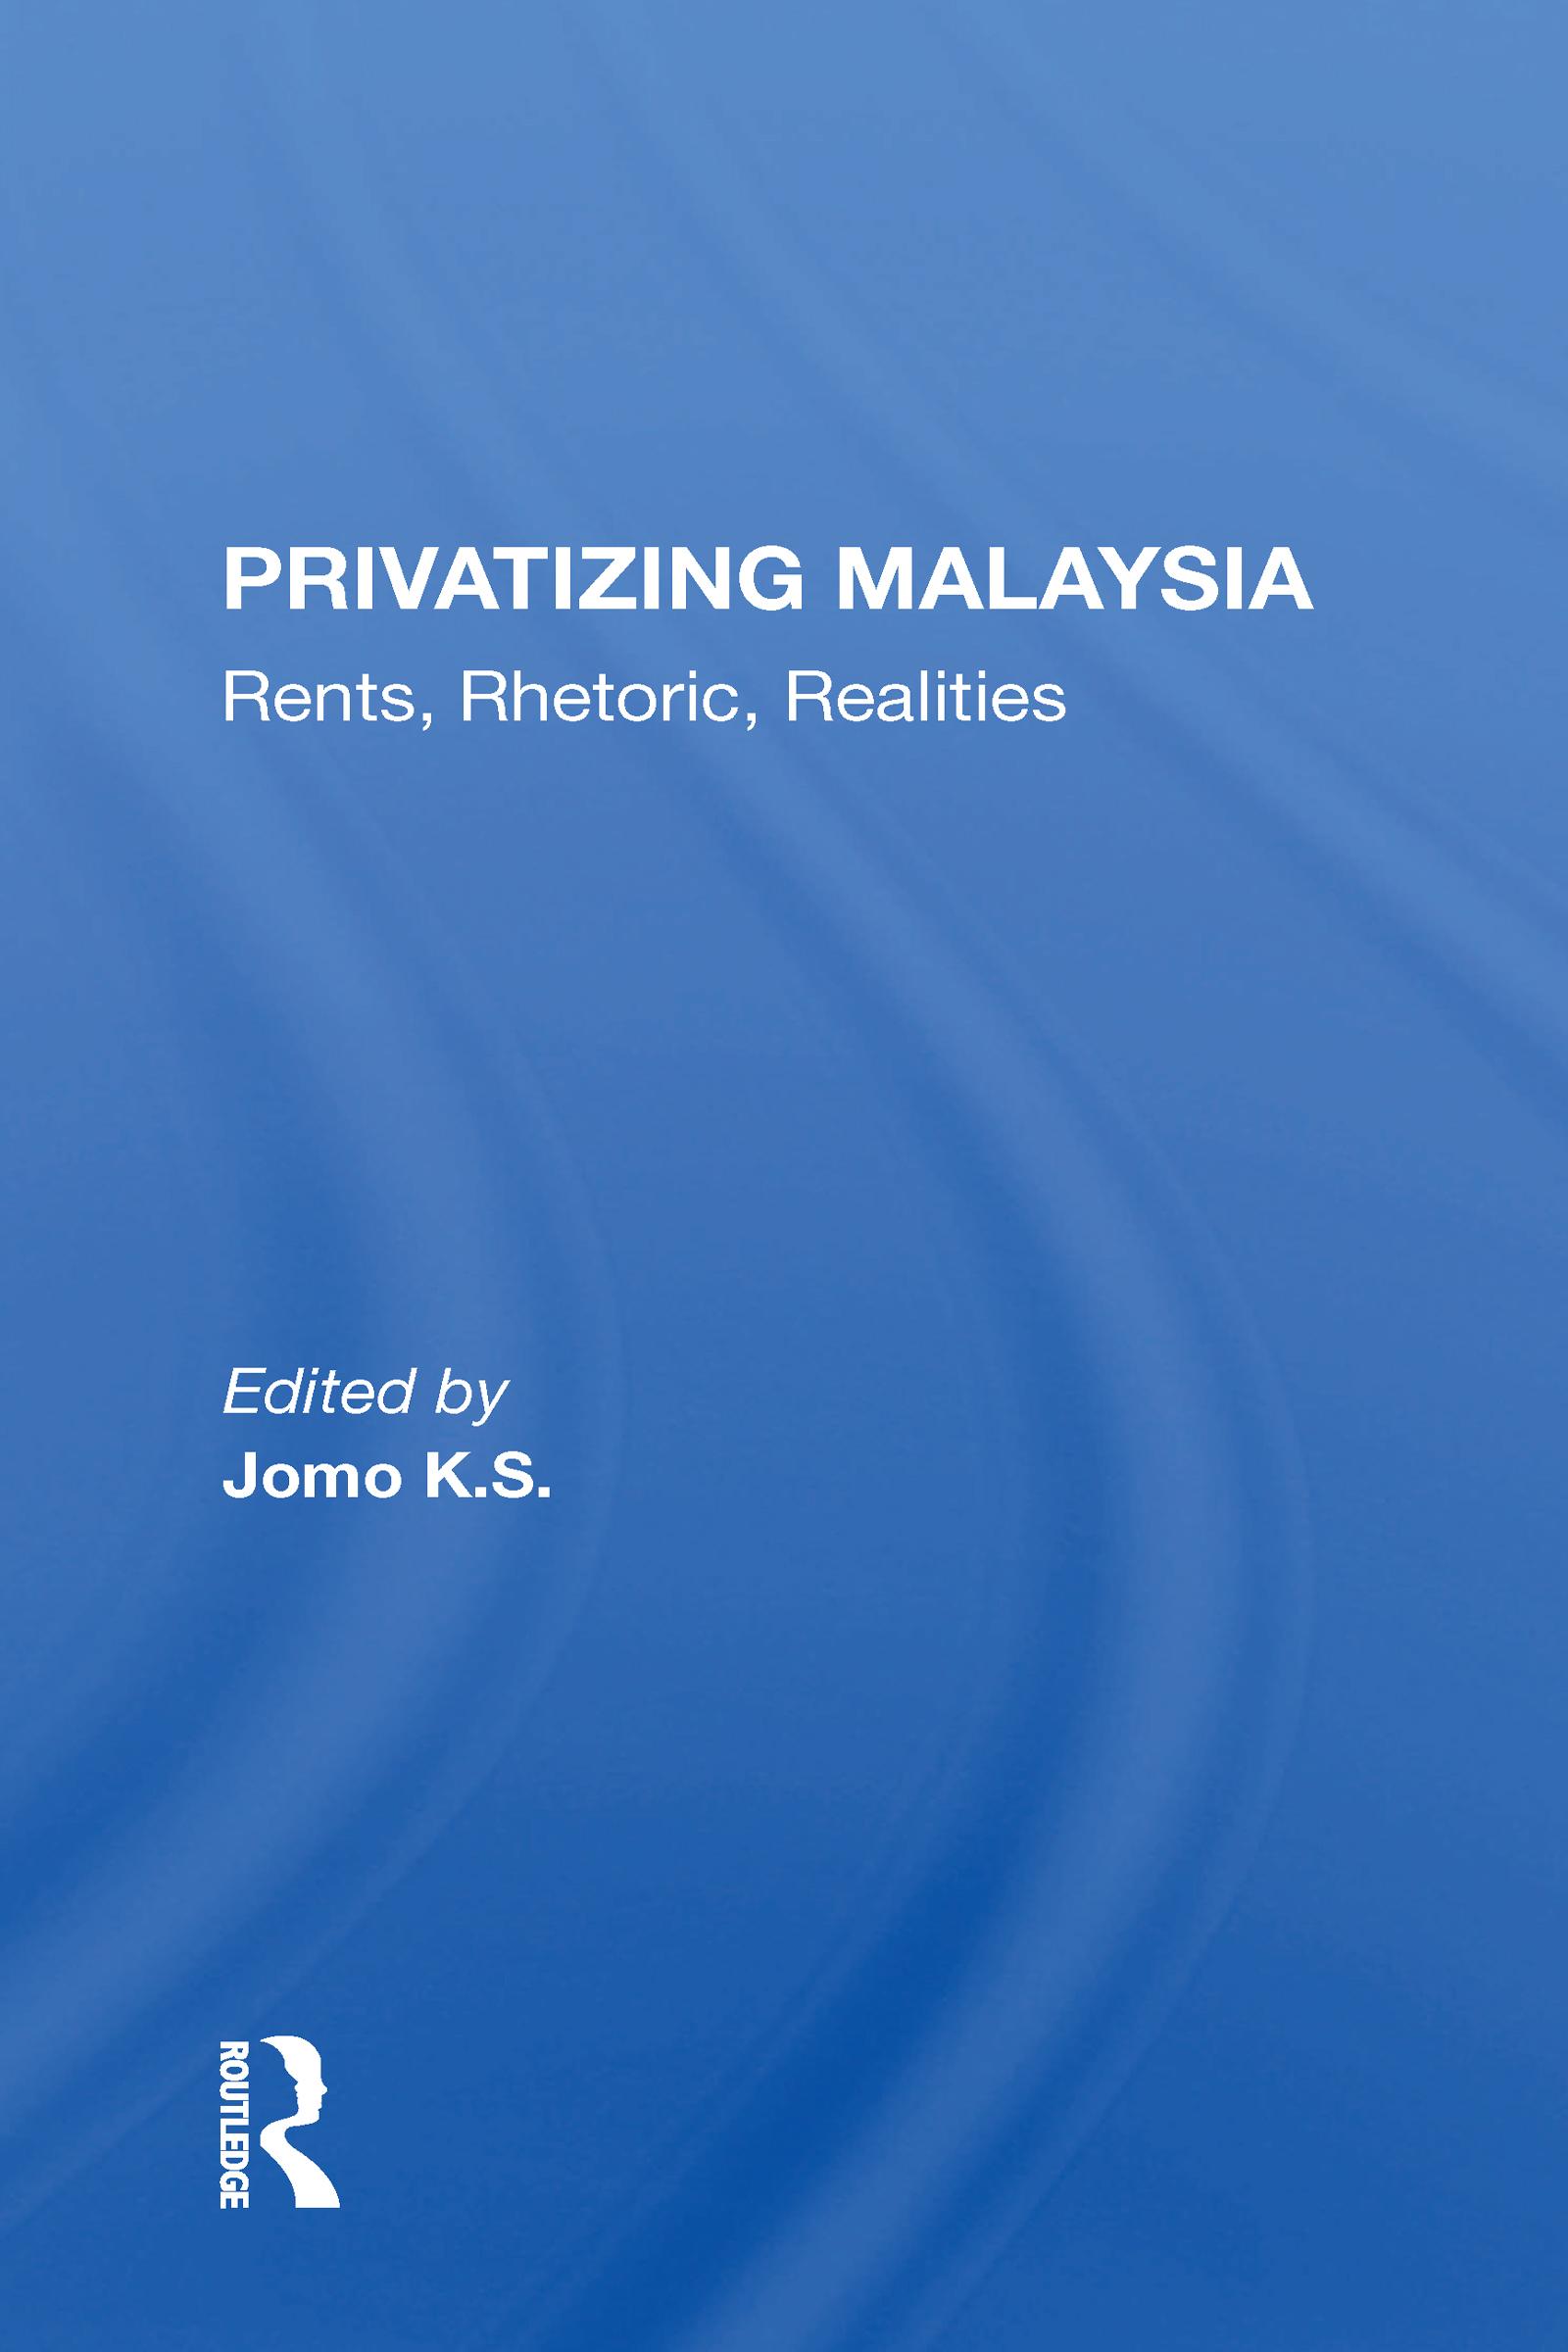 Privatizing Malaysia